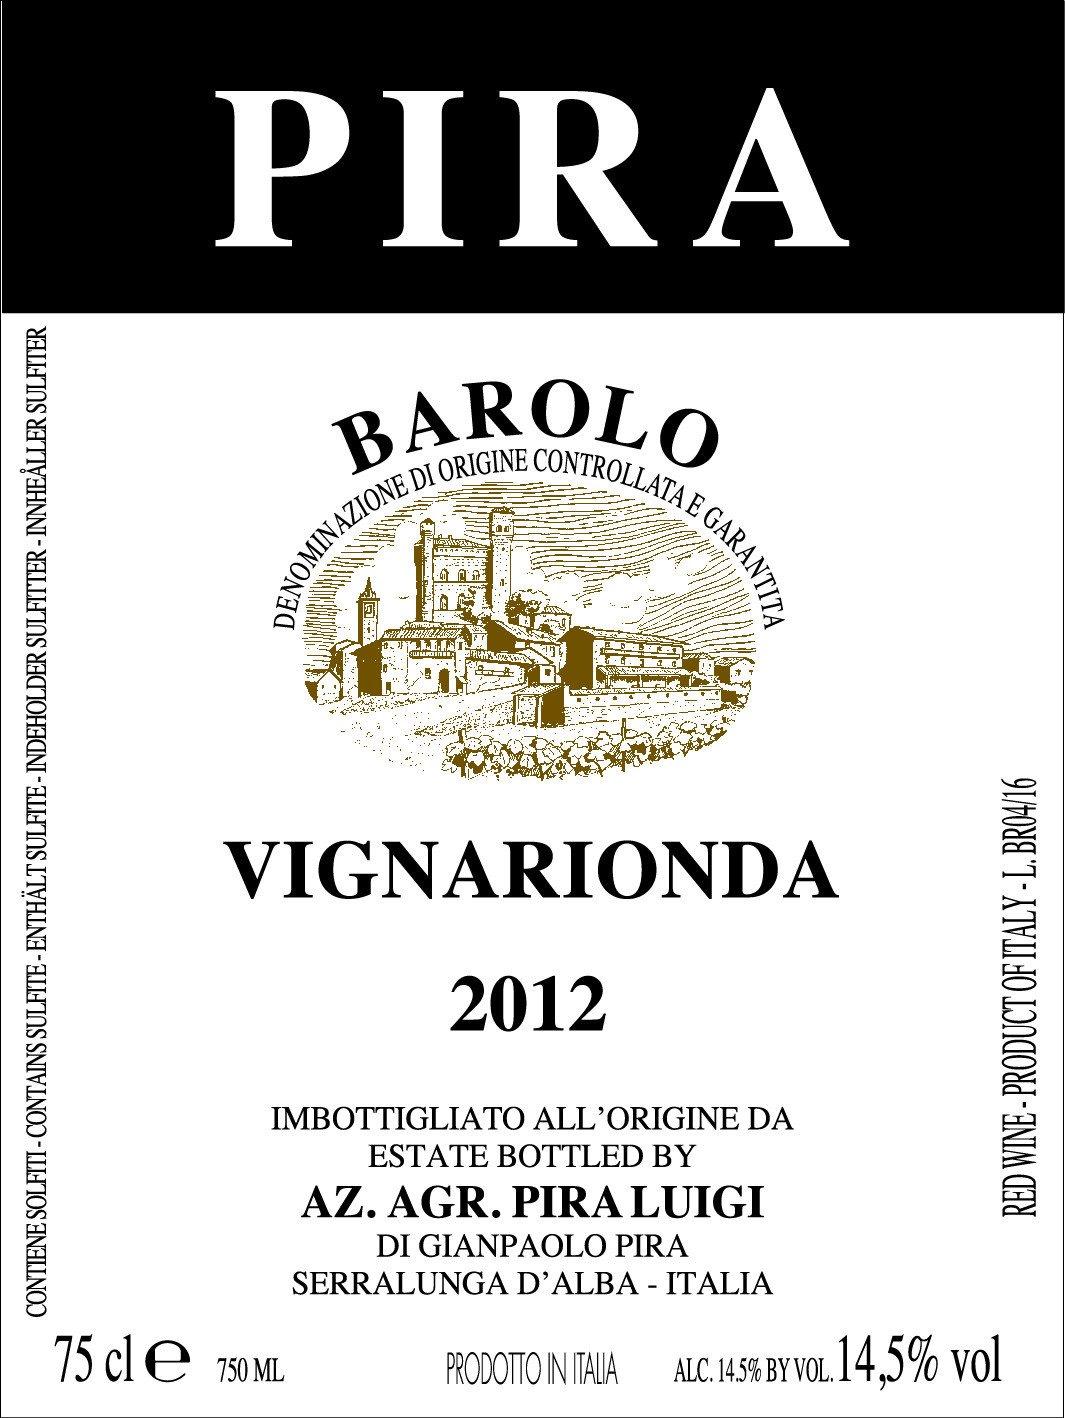 Pira Barolo Vignarionda 2012